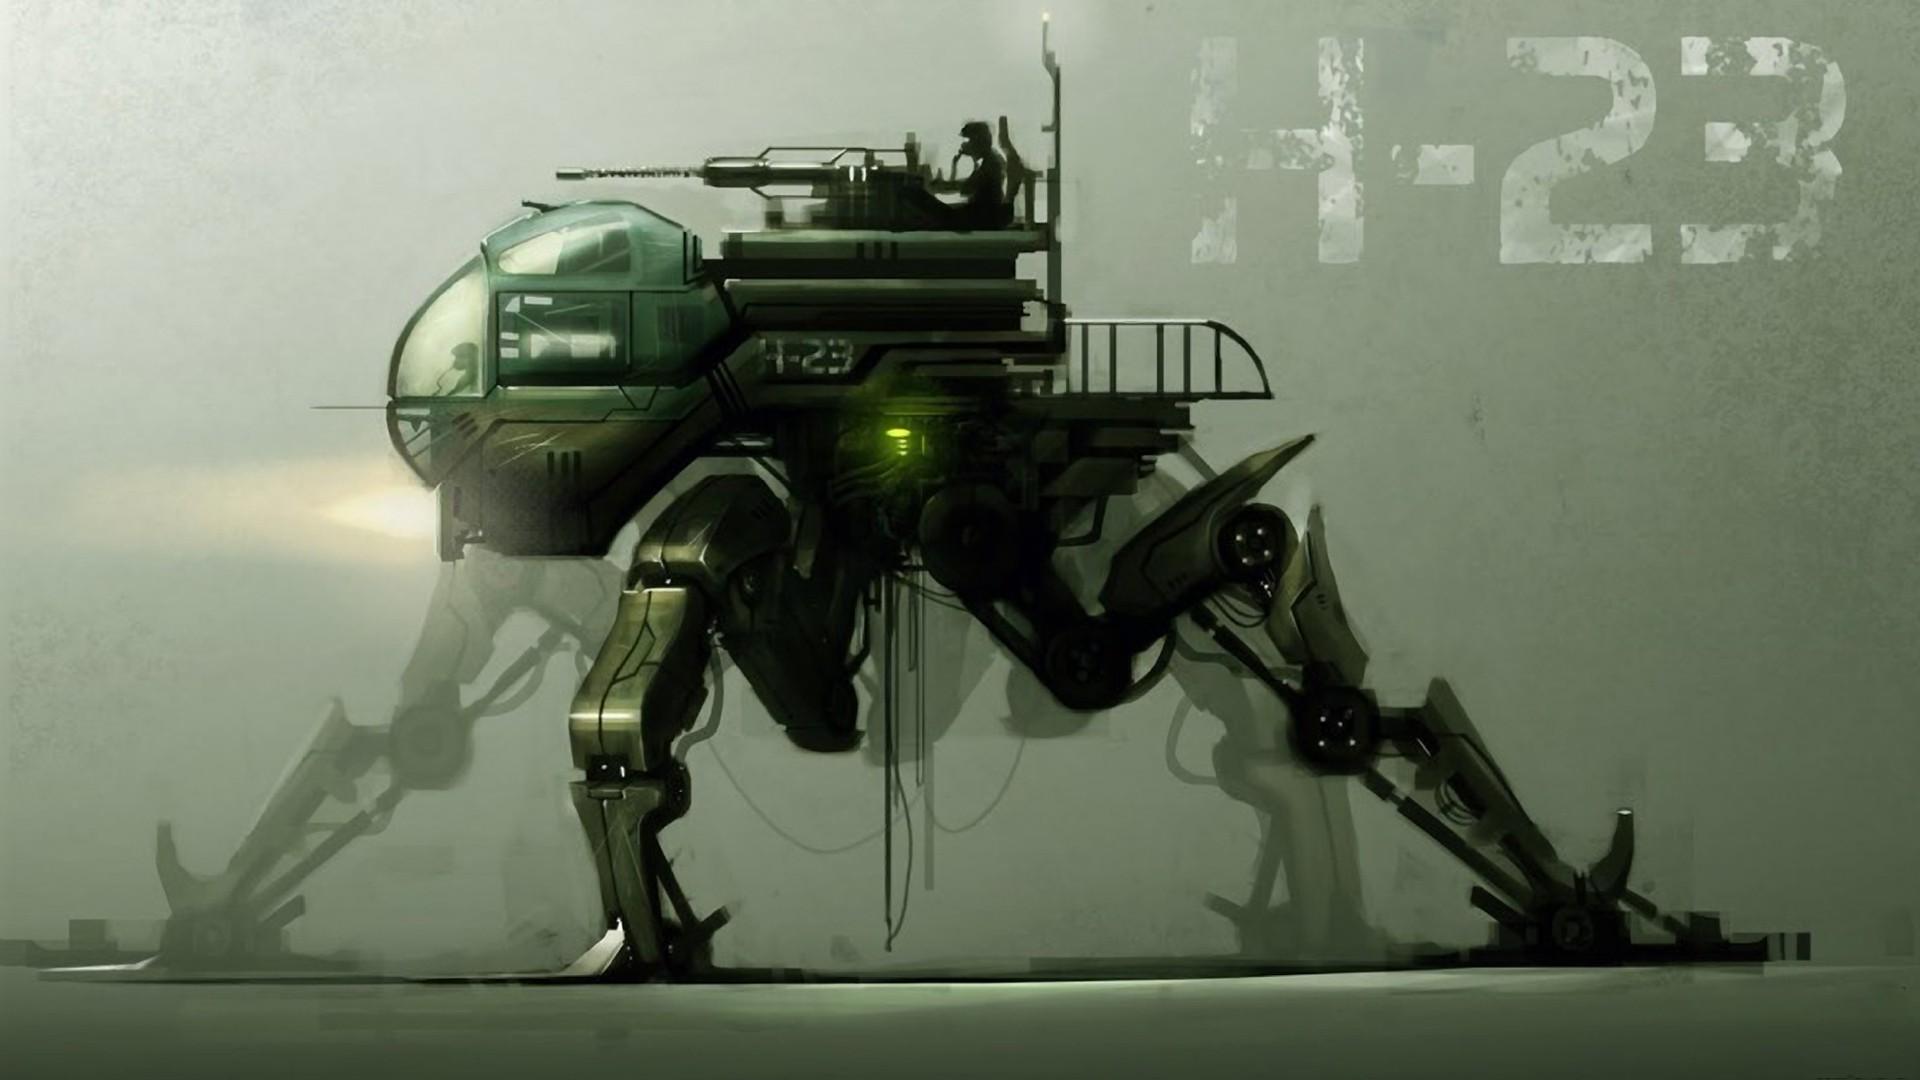 Fantasy Fantasy Art Futuristic Guns Robots Science Fi